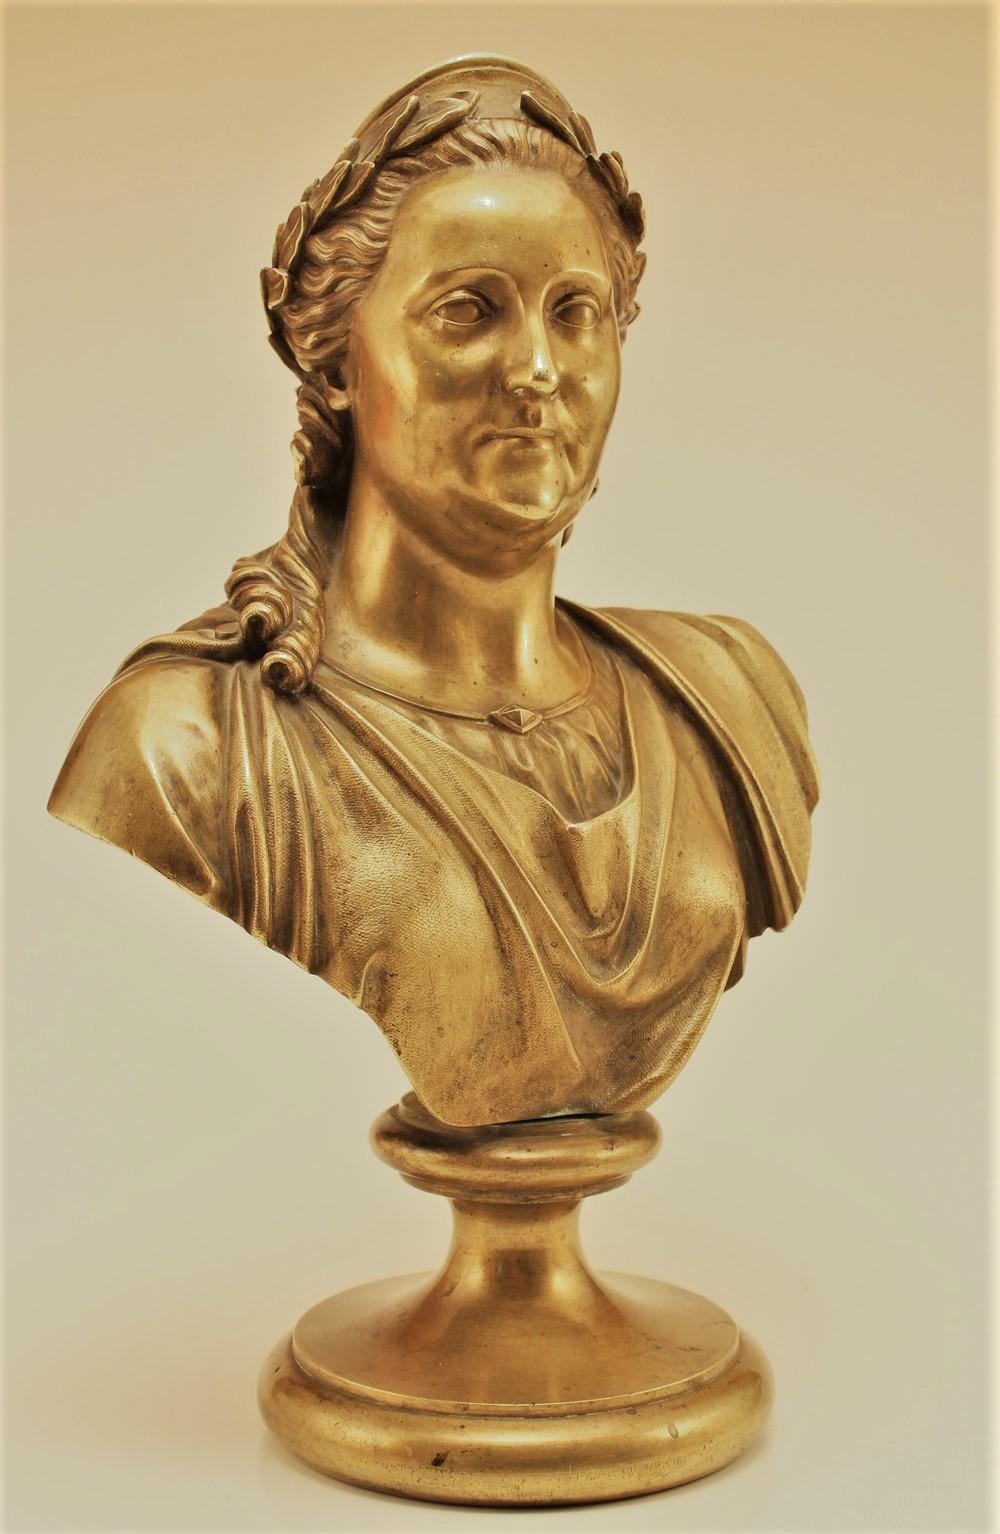 baron-peter-klodt - peter-baron-von-klodt-bronze-bust-ekaterina